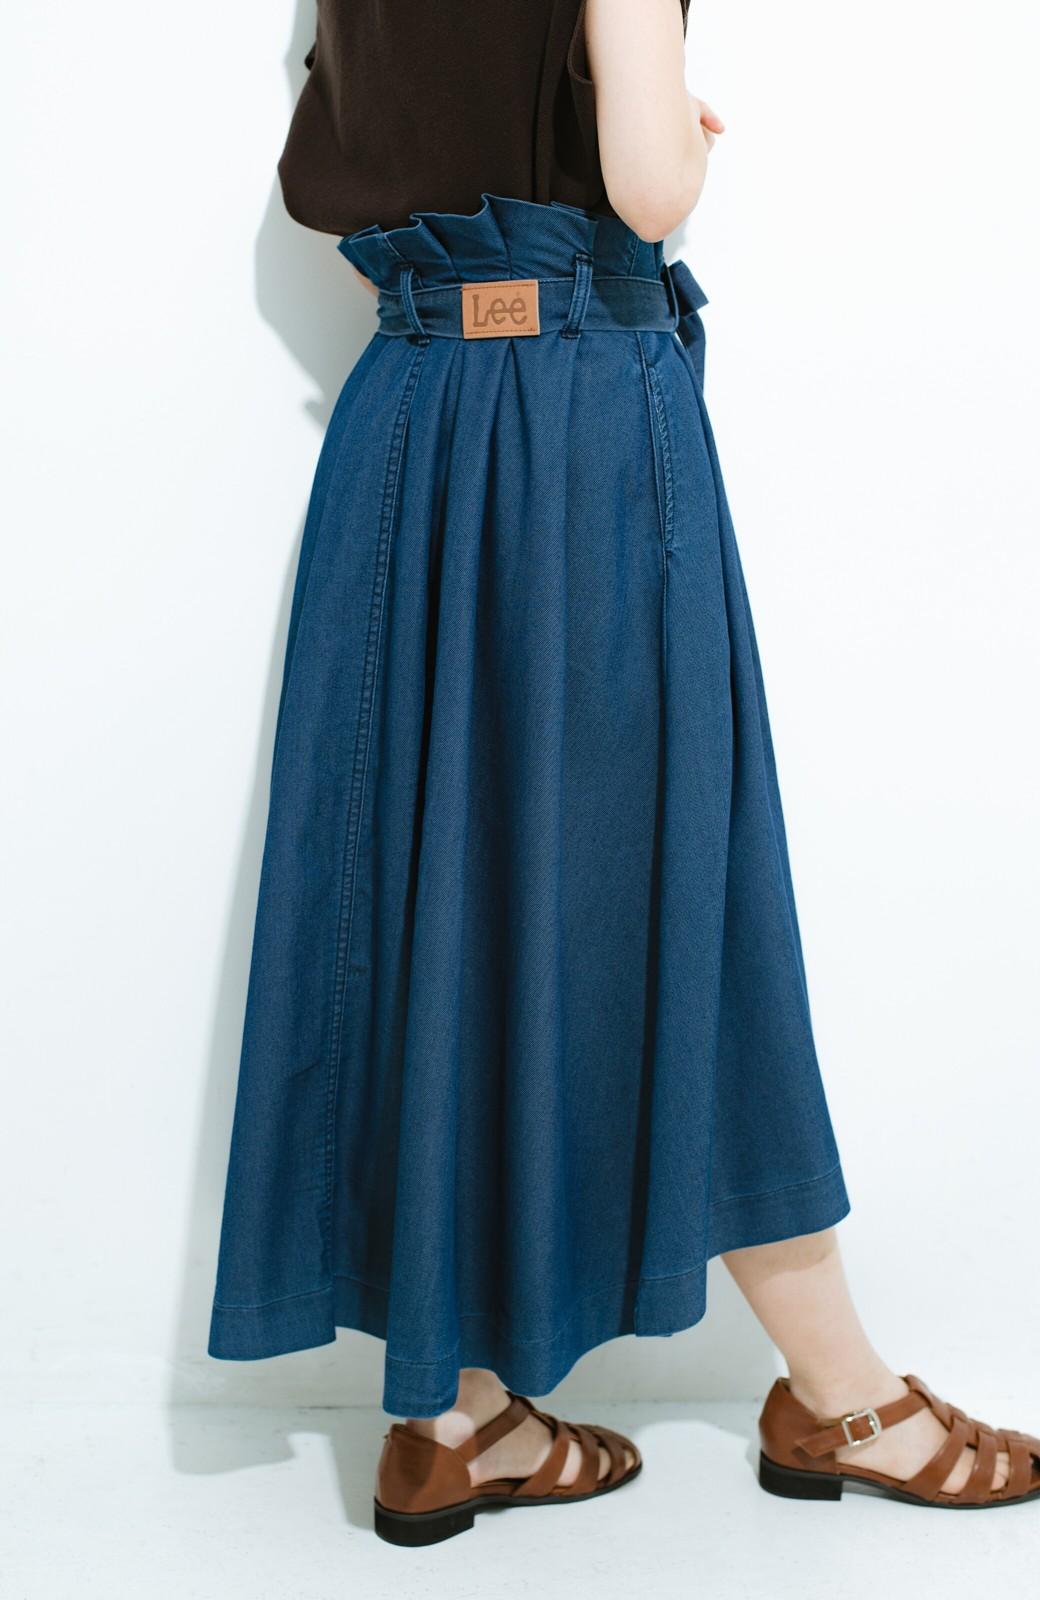 haco! Lady Lee ウエストリボンのペーパーバッグスカート <ブルー>の商品写真4